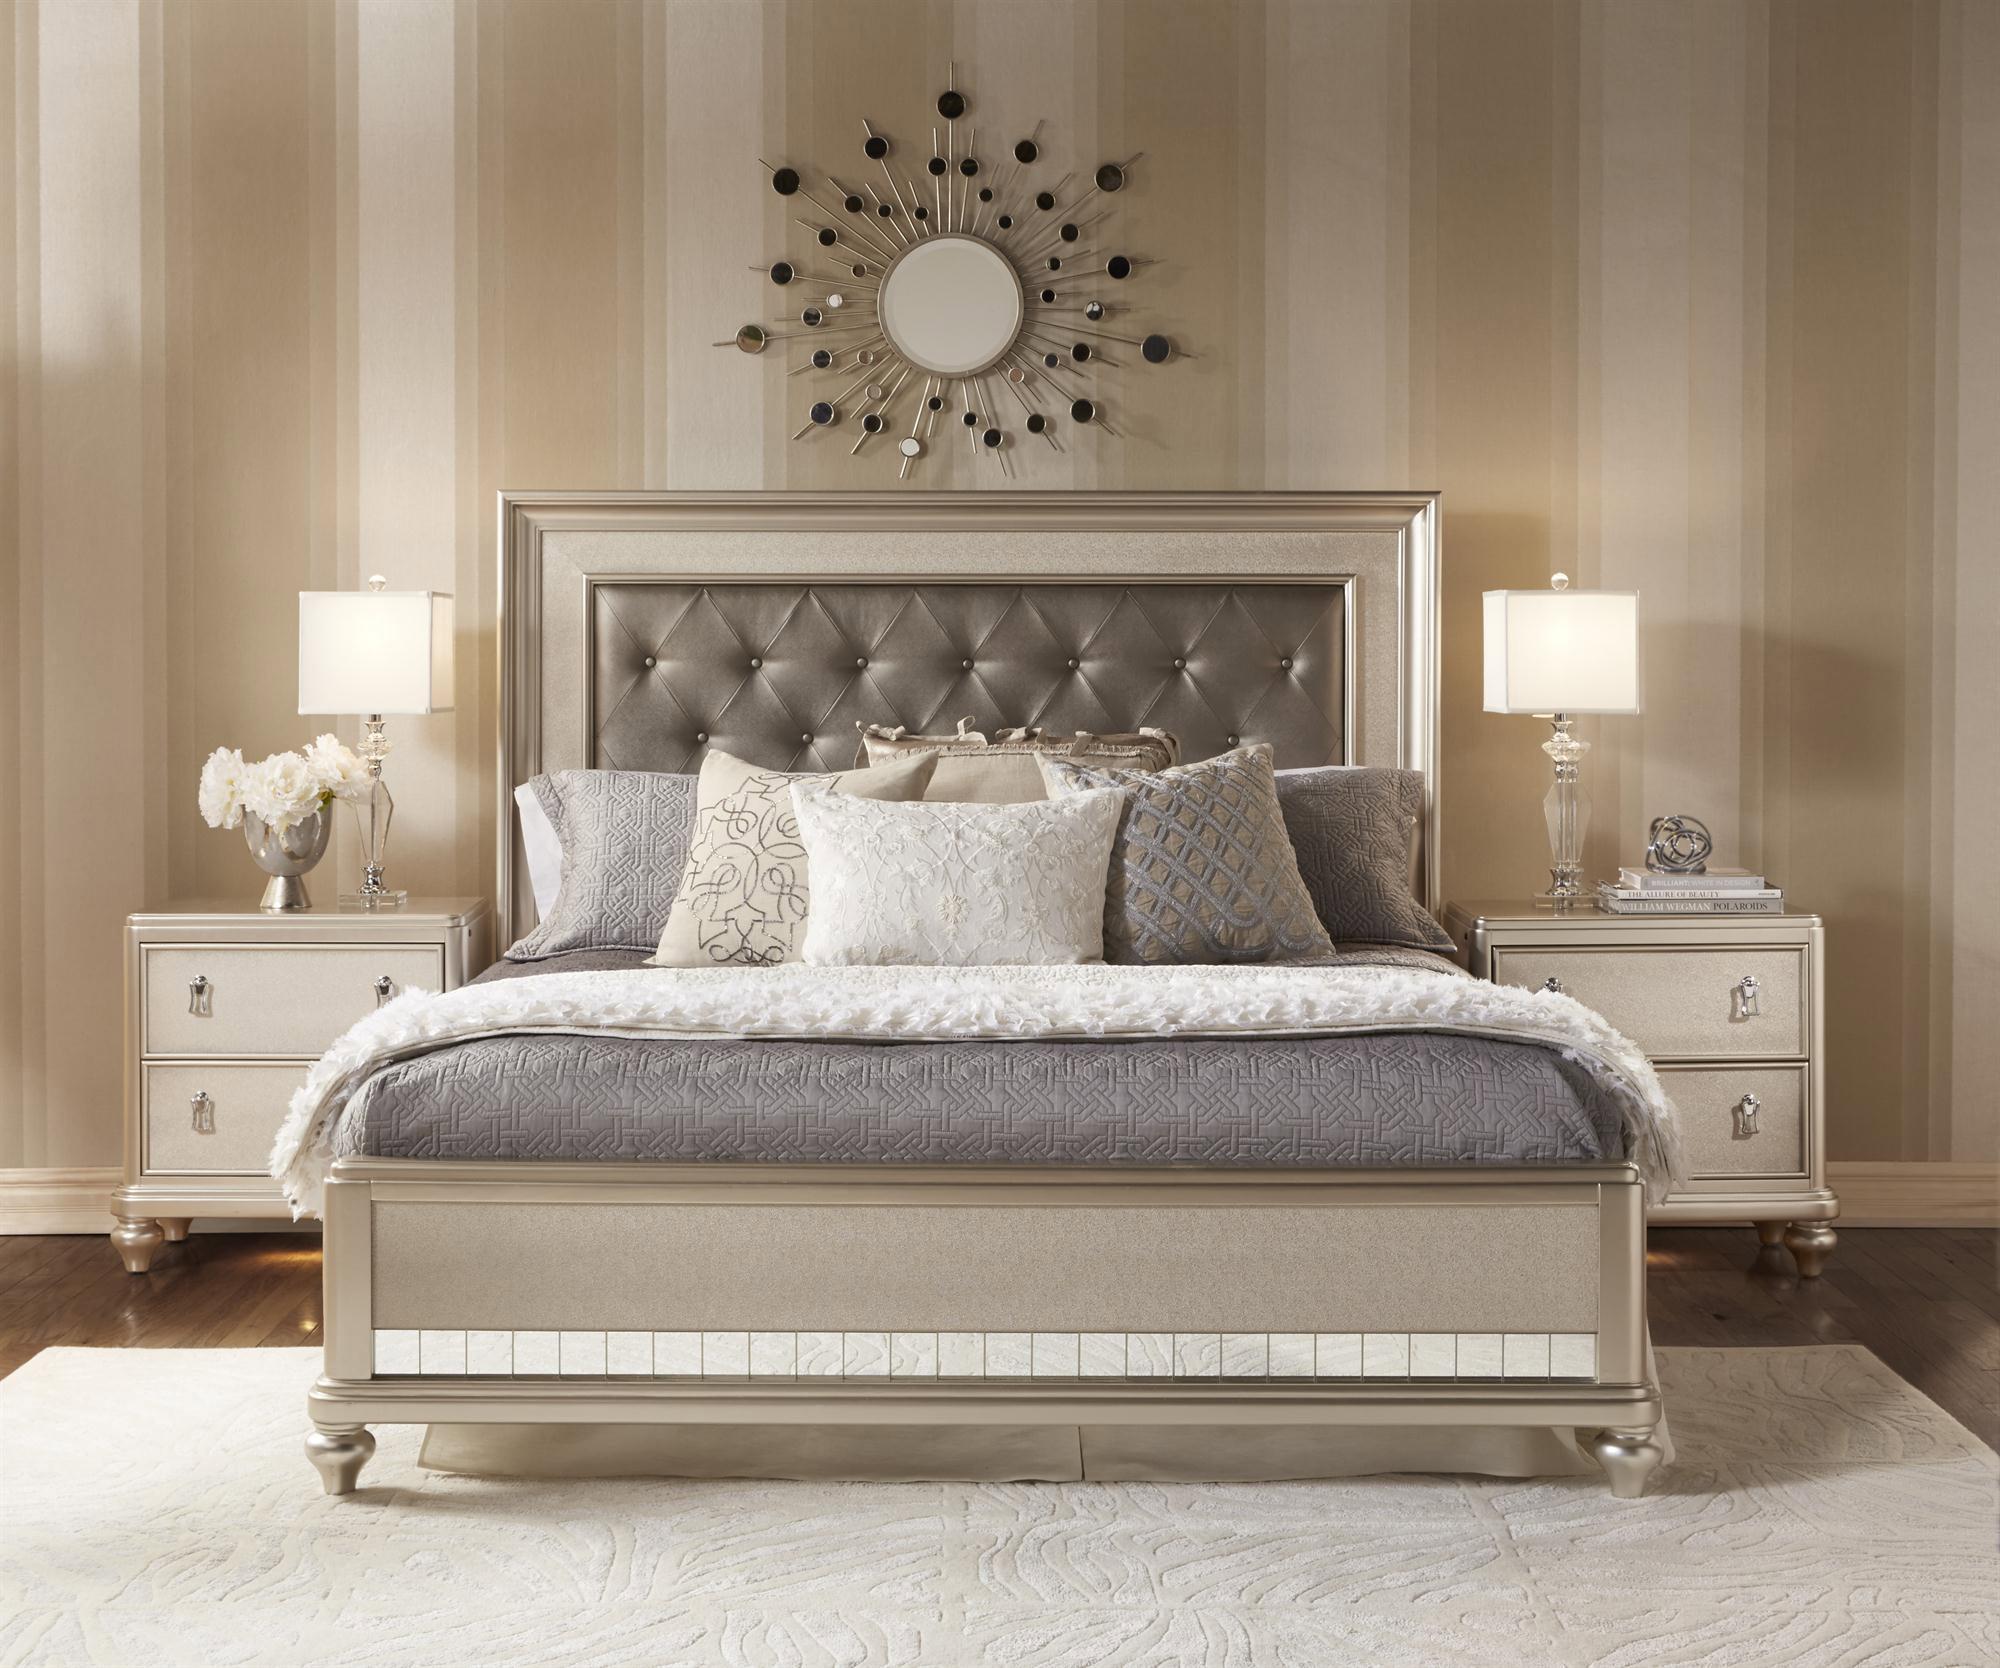 Diva Queen Upholstered Bed   Samuel Lawrence   Home Gallery Stores. Diva Queen Upholstered Bed   Samuel Lawrence   Home Gallery Stores